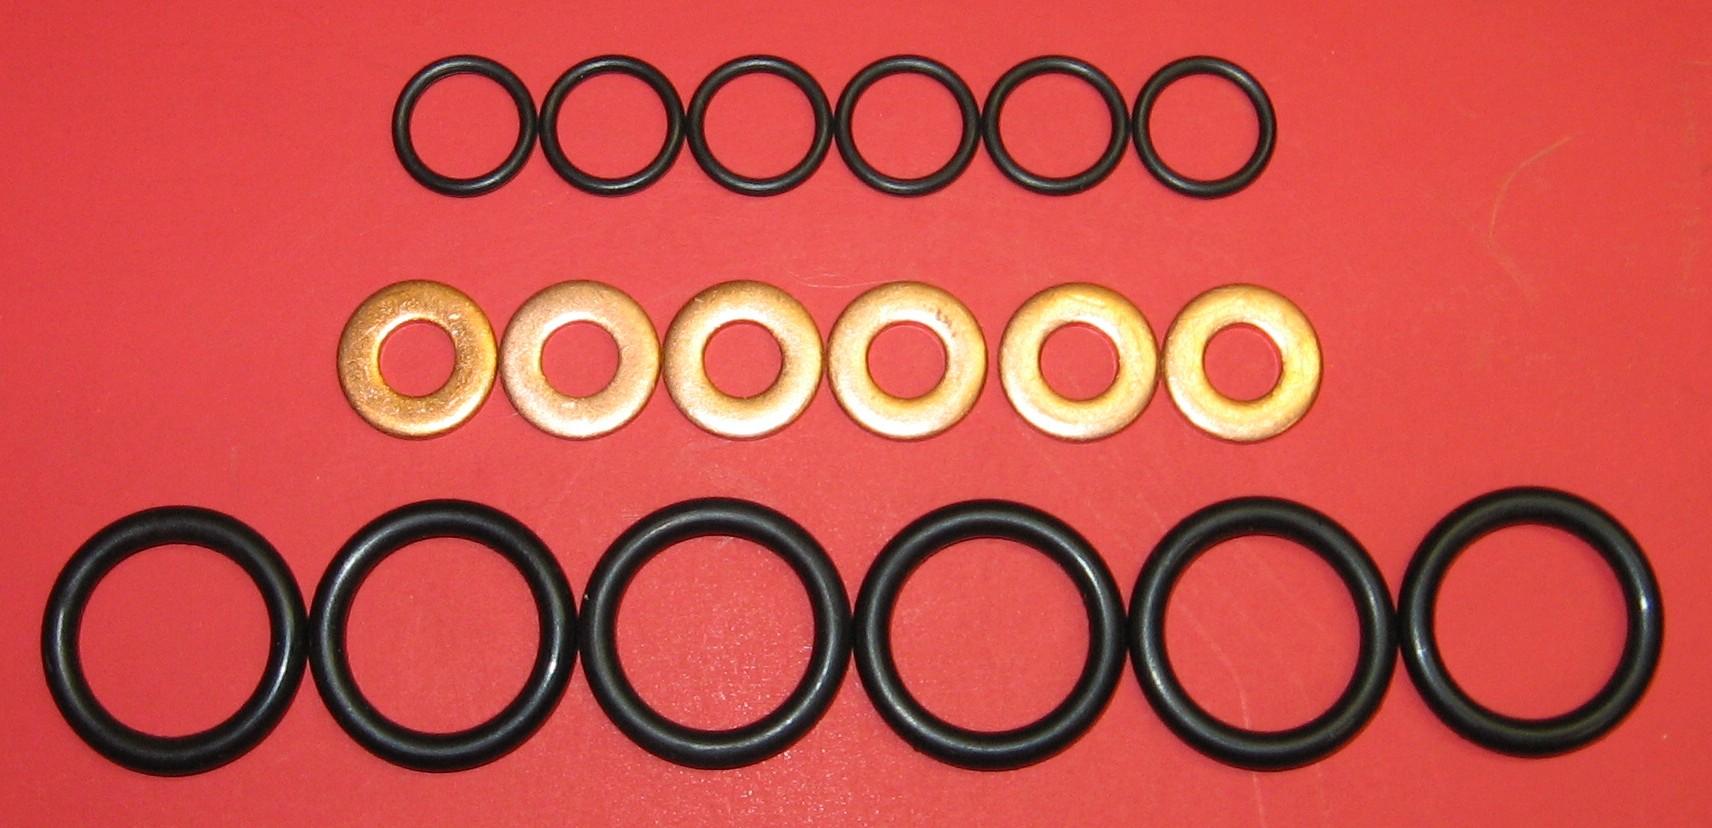 Cummins Diesel Parts Accessories Accurate 2001 Dodge Ram Fuel Filter Location 59l 24v Injector Installation Kit 24 Valve